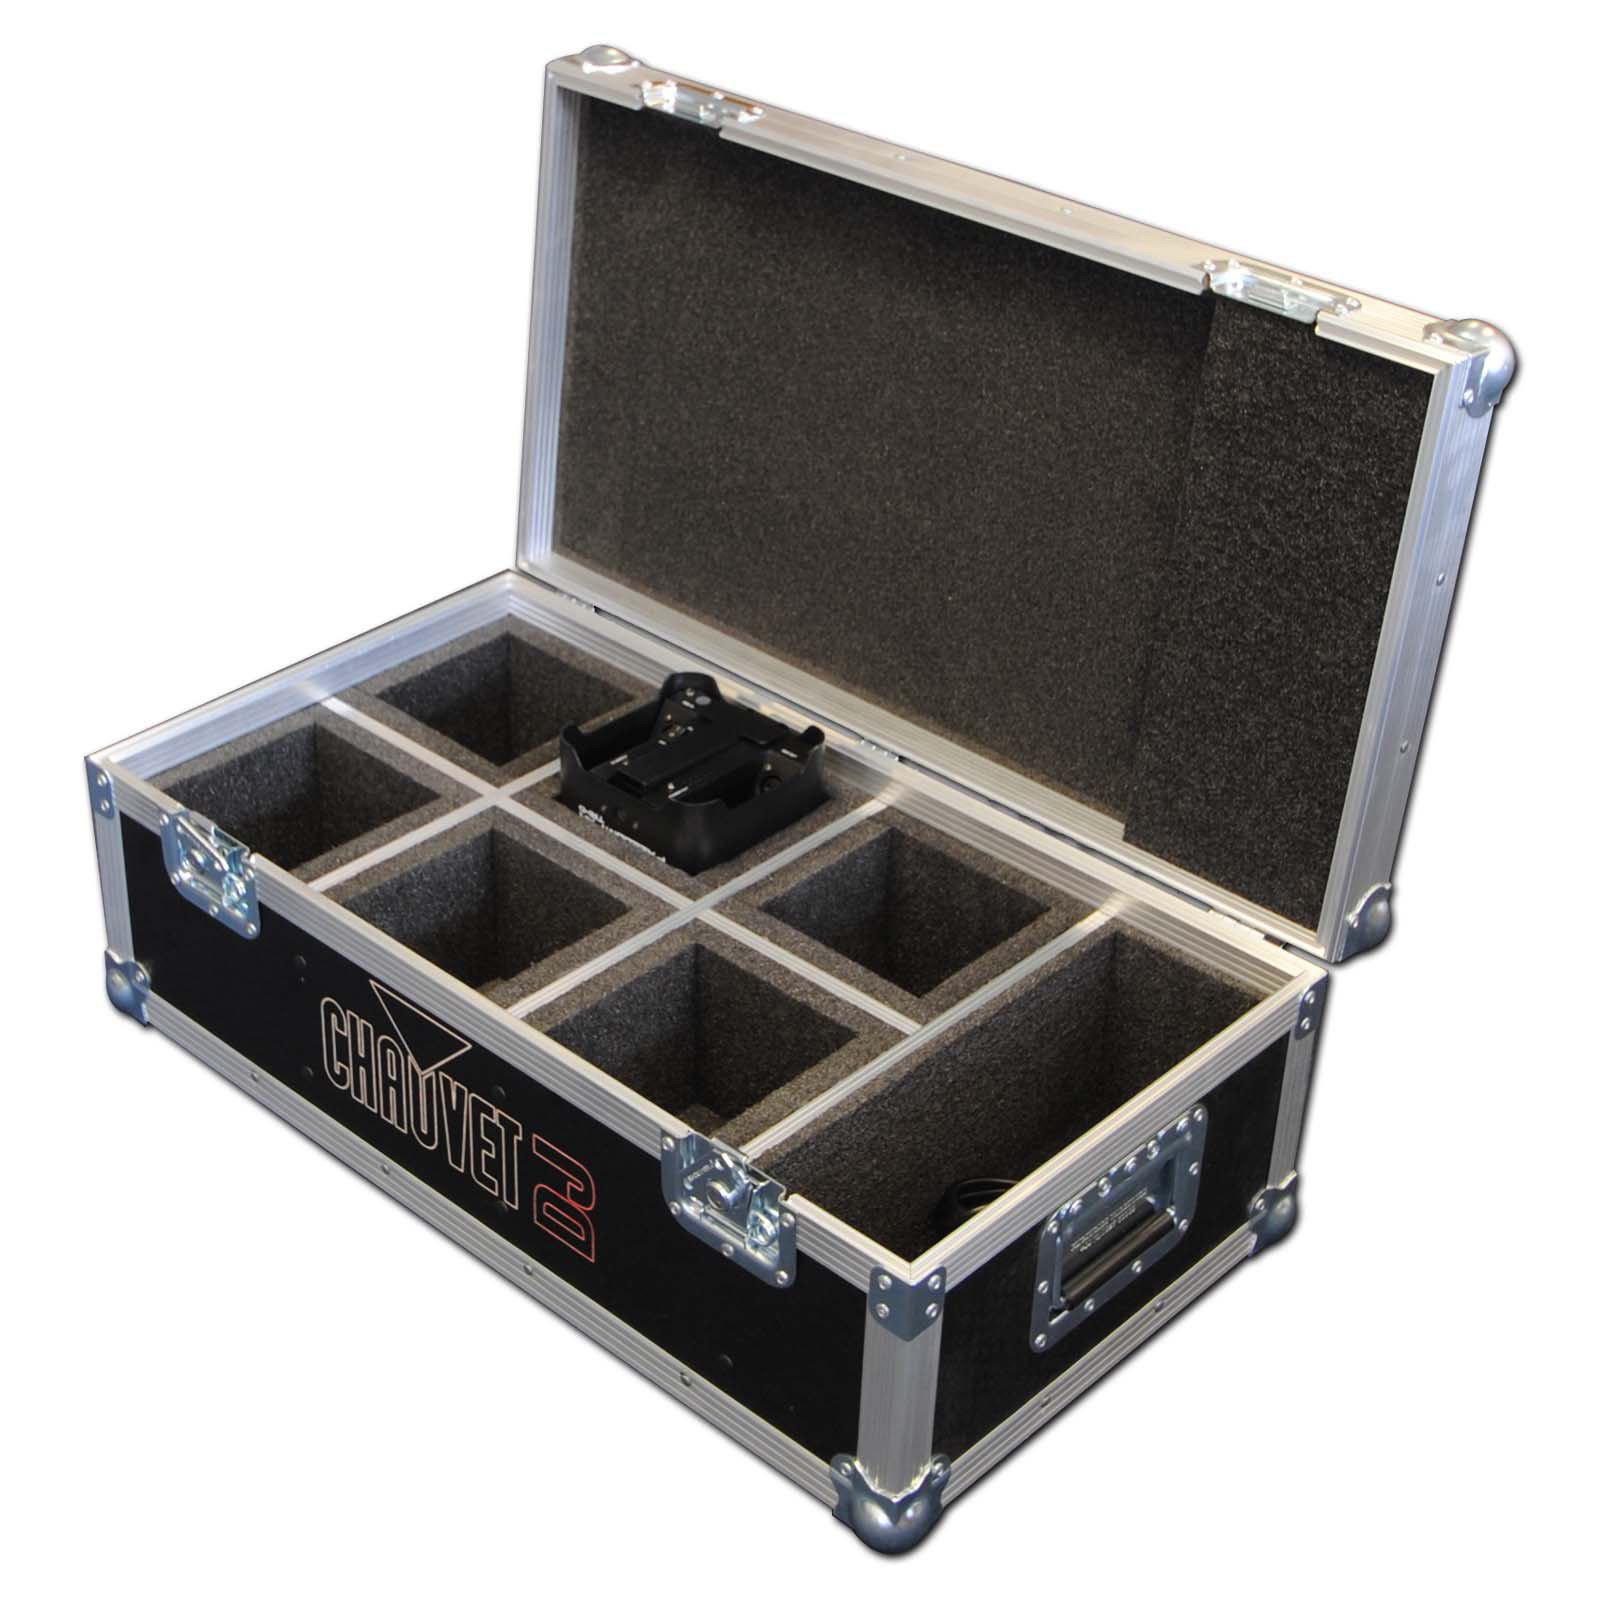 chauvet 6 way freedom par hex 4 flight case. Black Bedroom Furniture Sets. Home Design Ideas